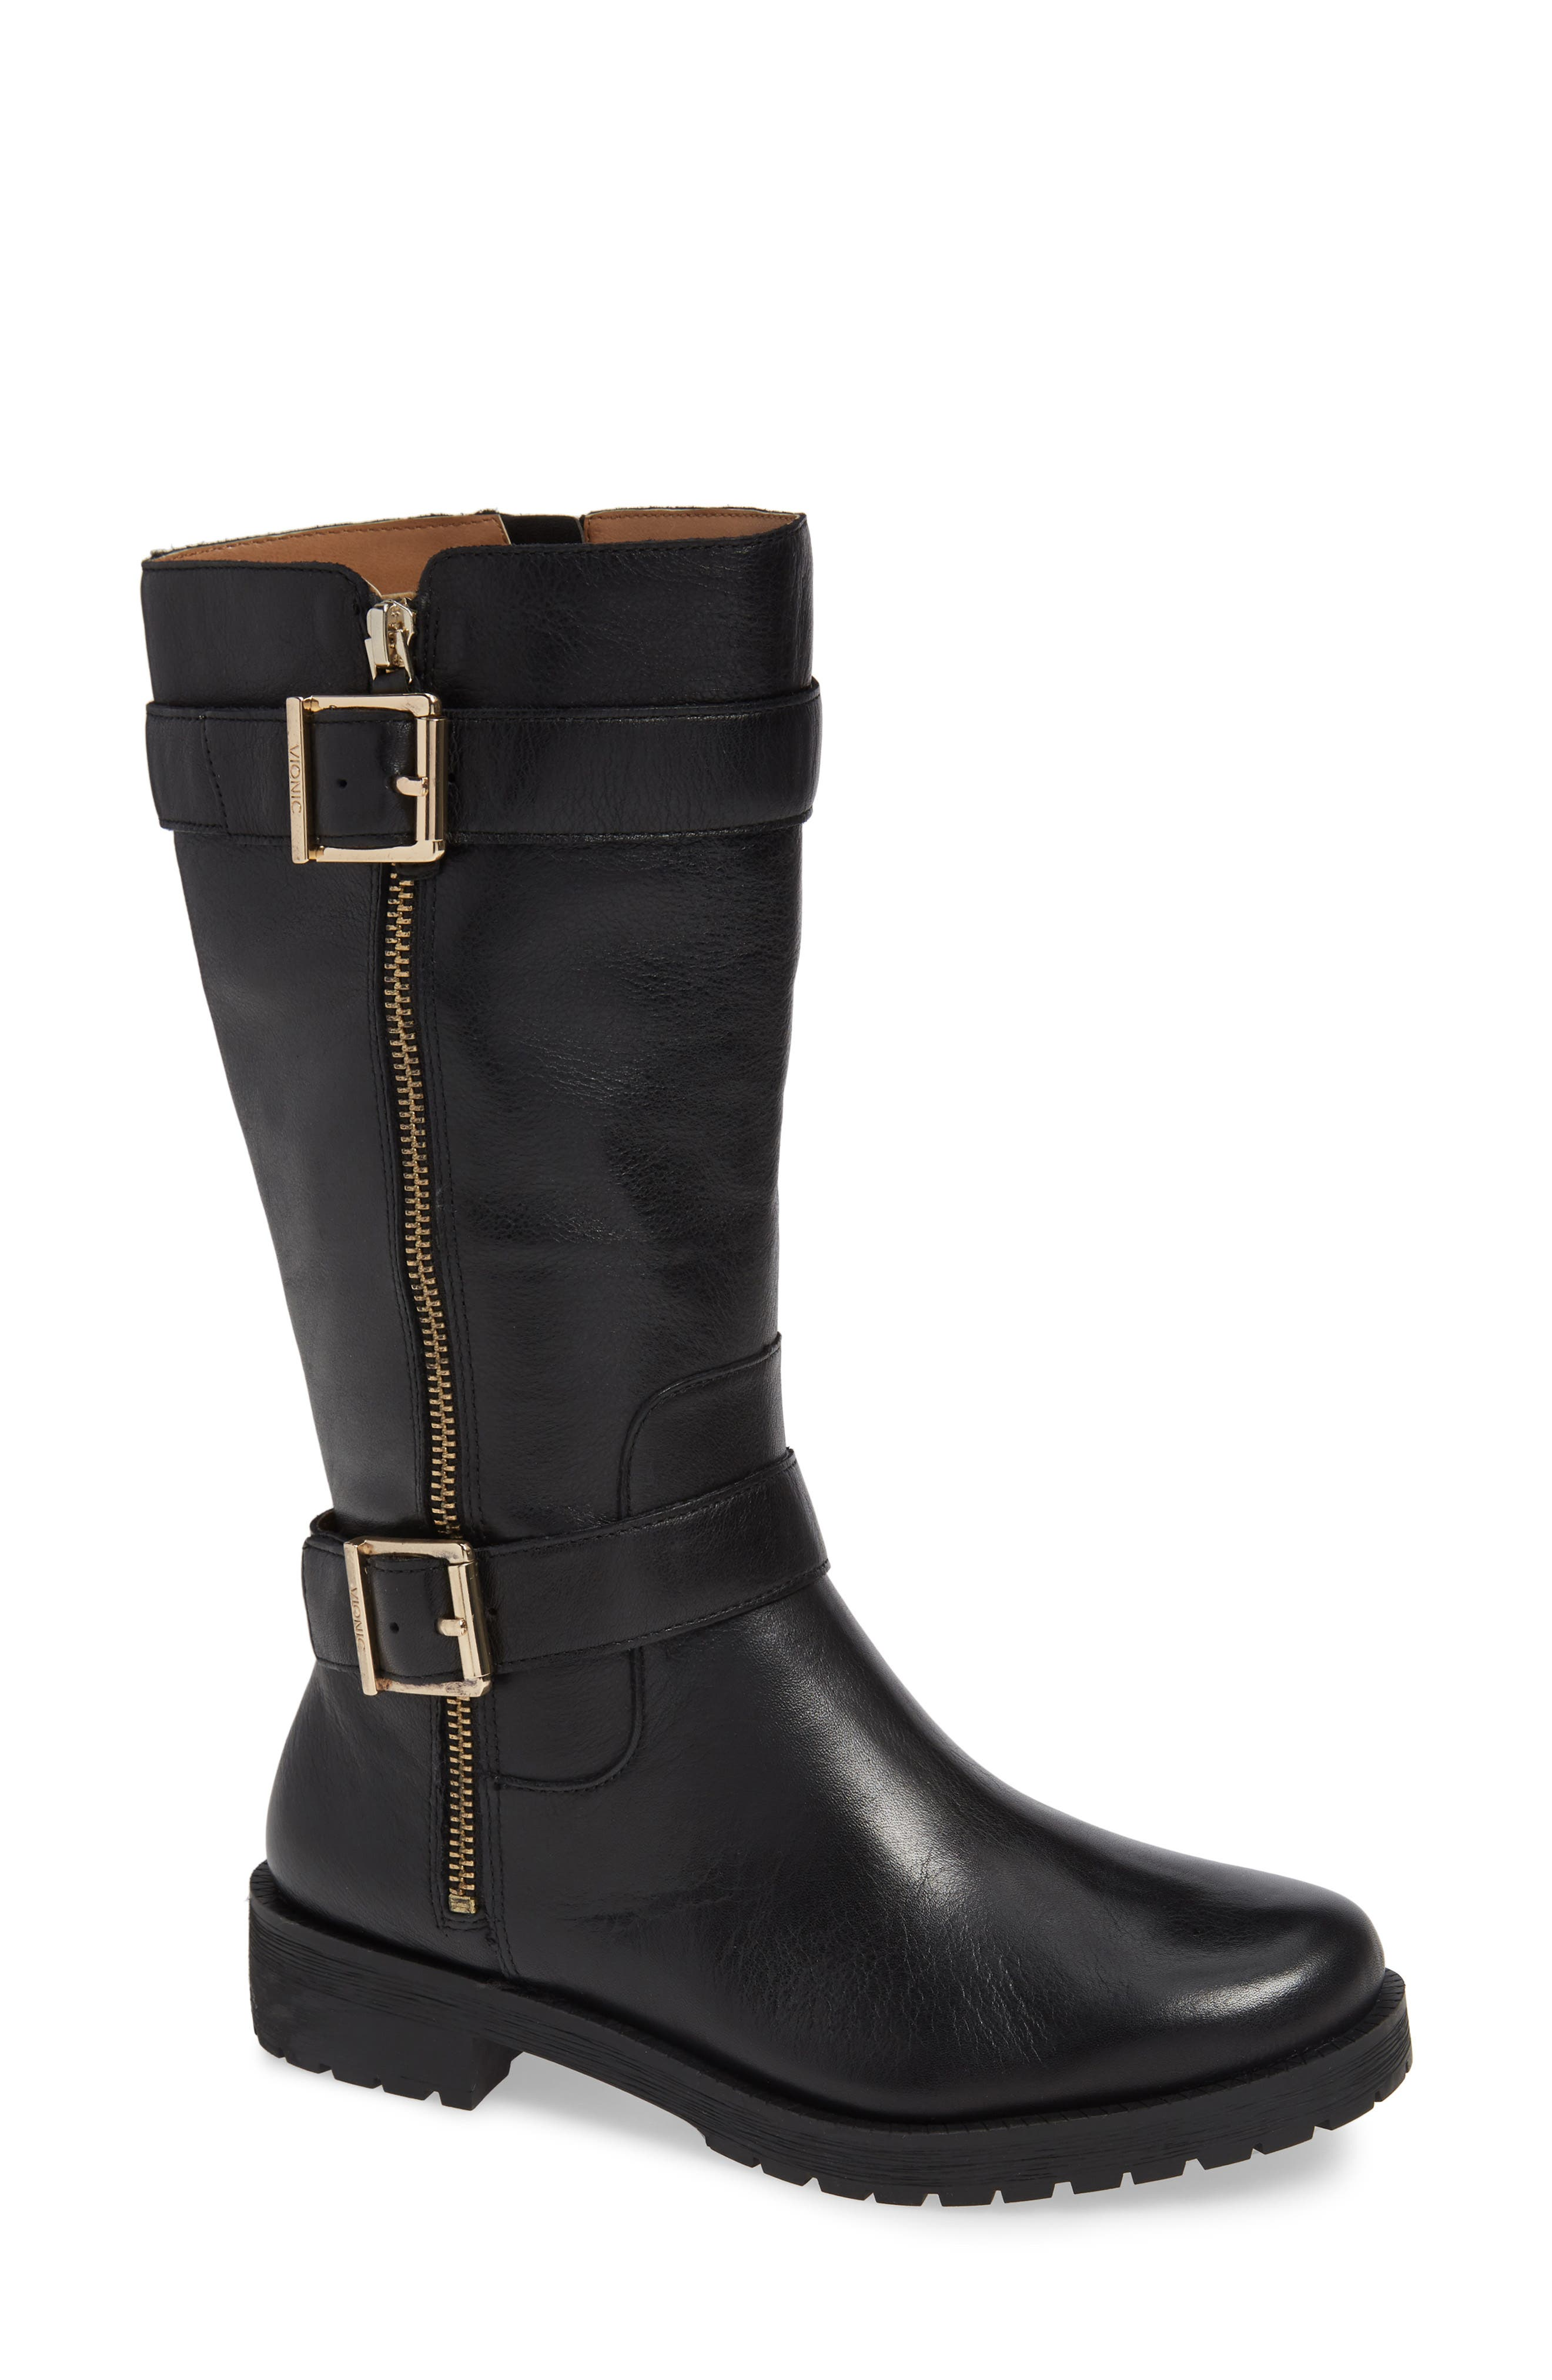 Vionic Marlow Boot- Black